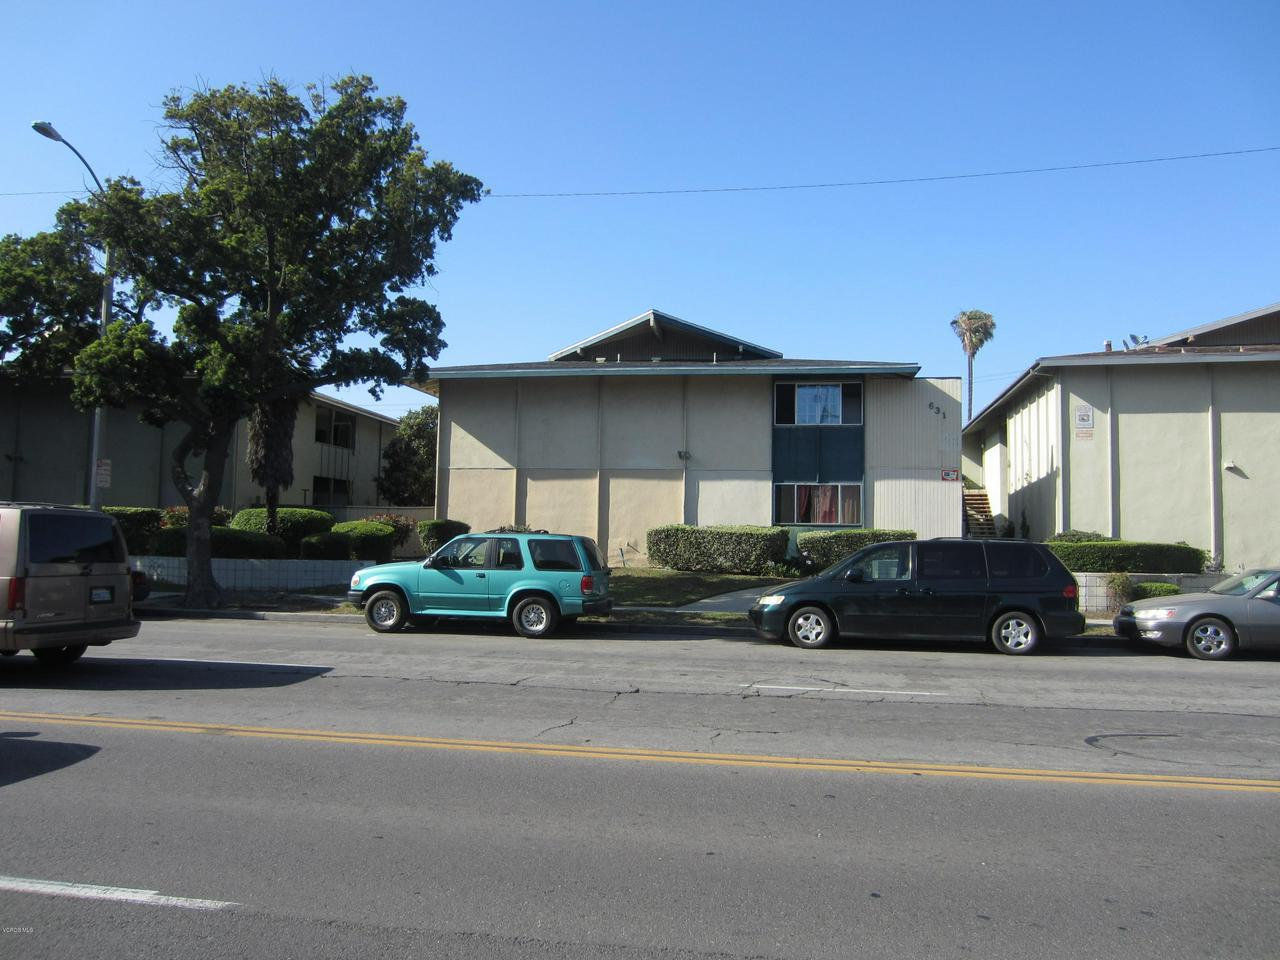 631 W CHANNEL ISLANDS Boulevard, Oxnard, CA 93033